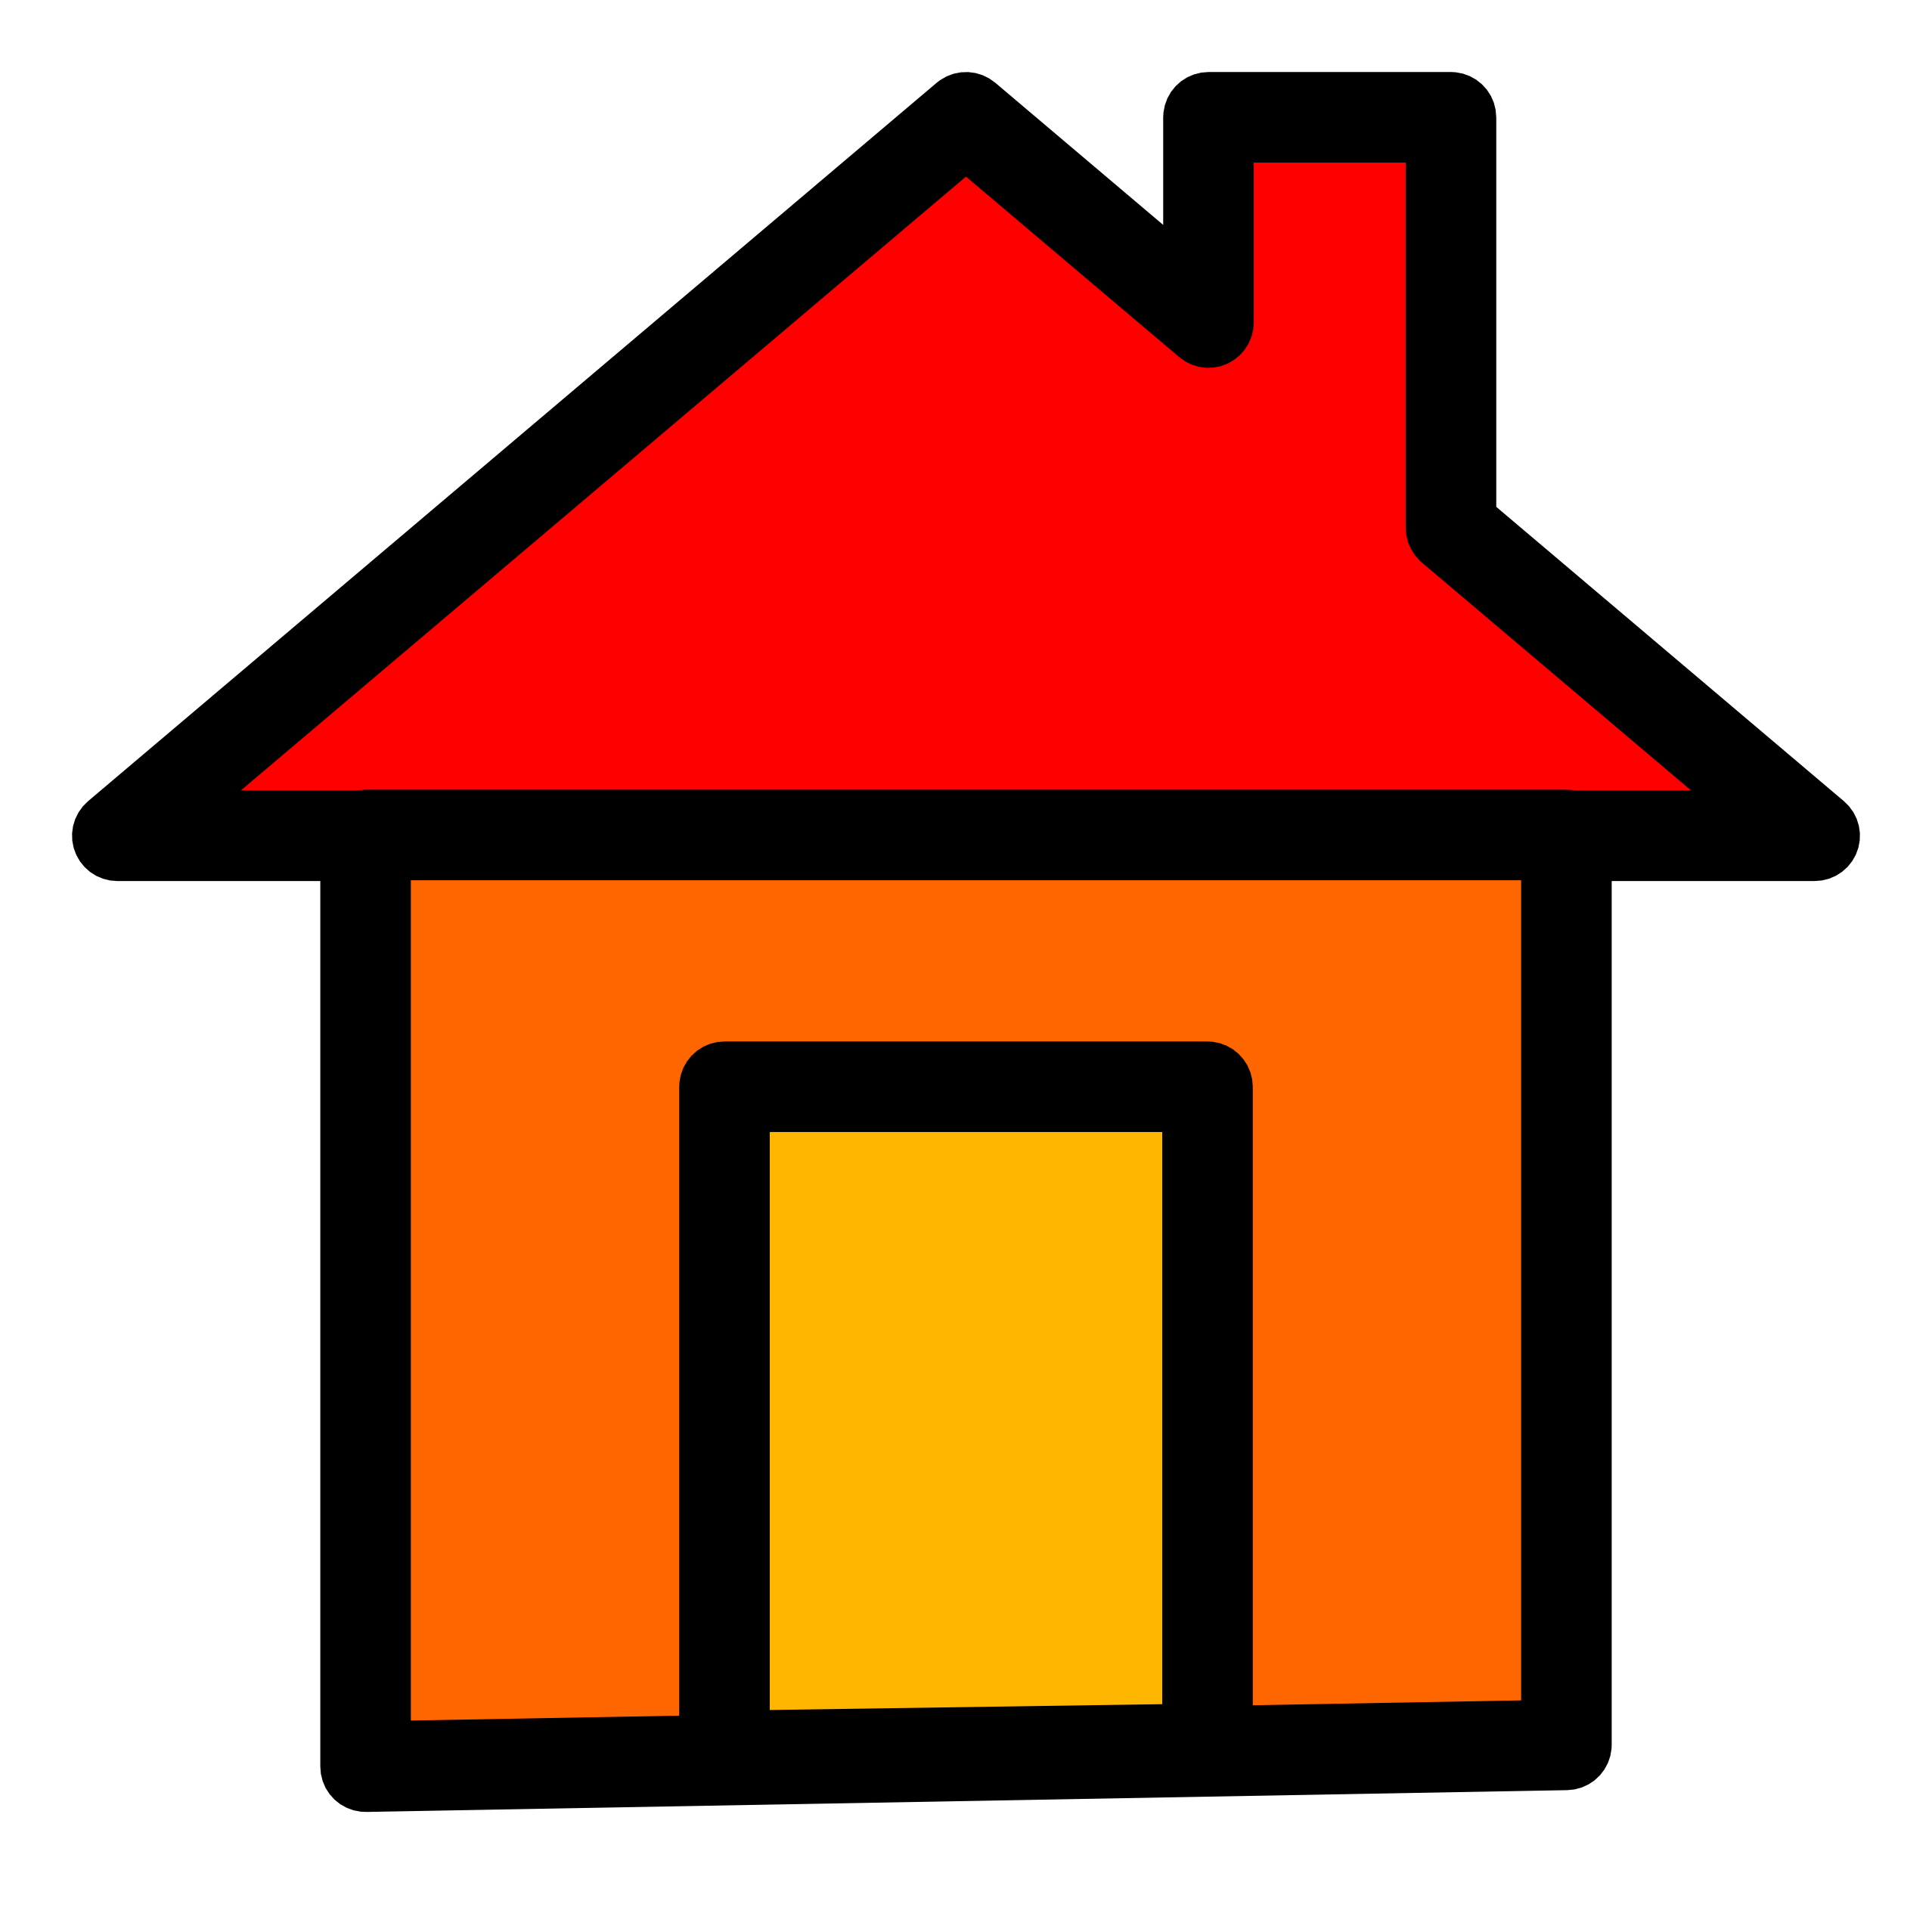 clipart rumah-#1